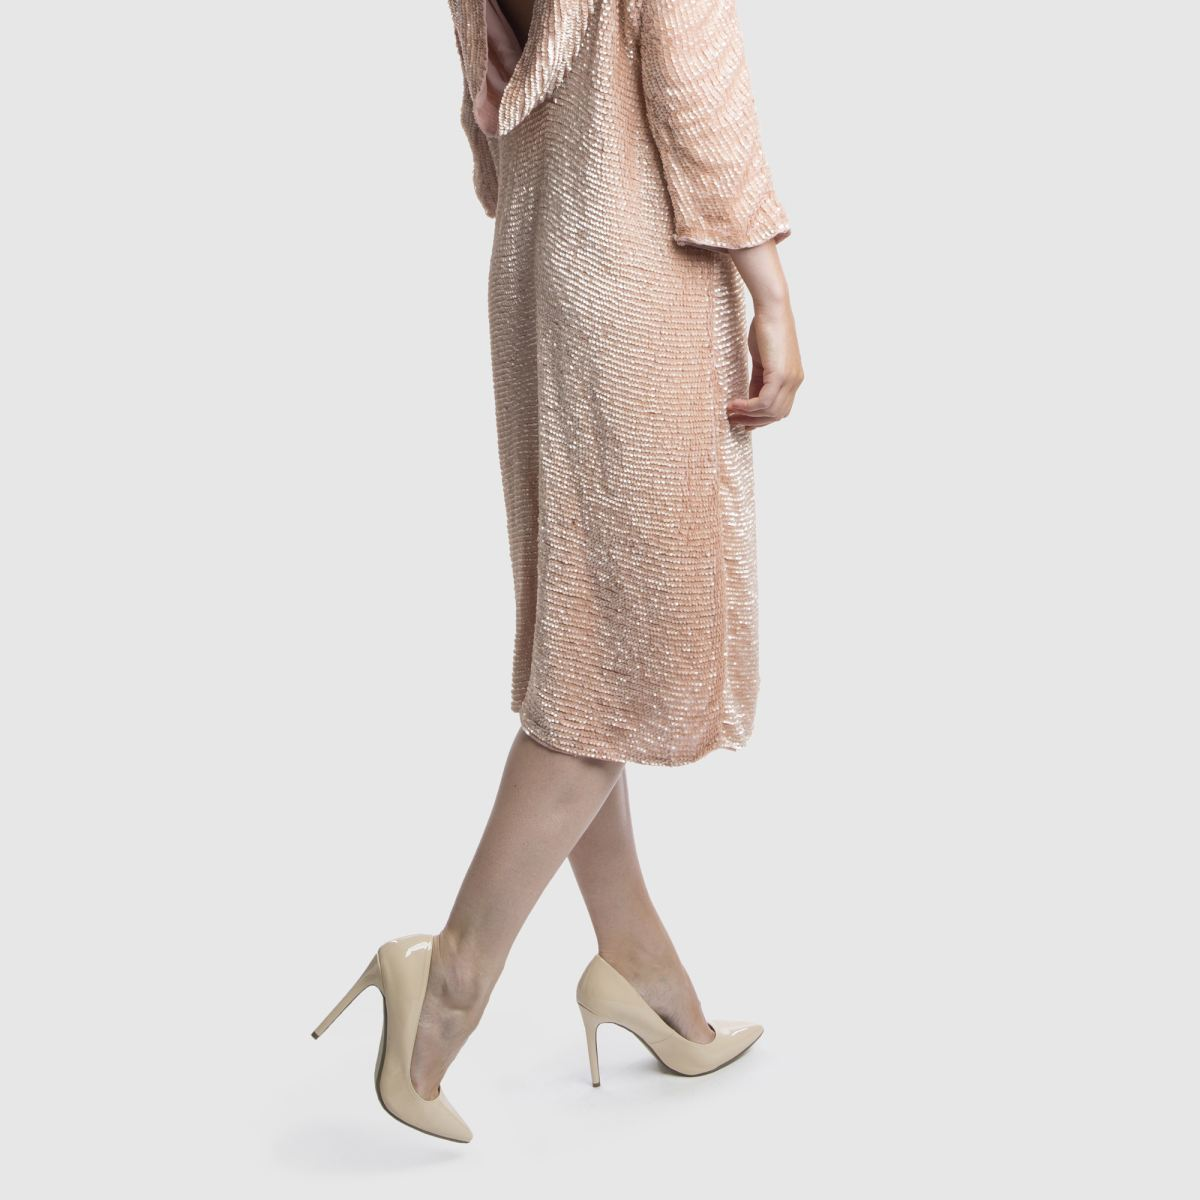 Damen Naturfarben missguided Point Toe High Heels | schuh Gute Qualität beliebte Schuhe